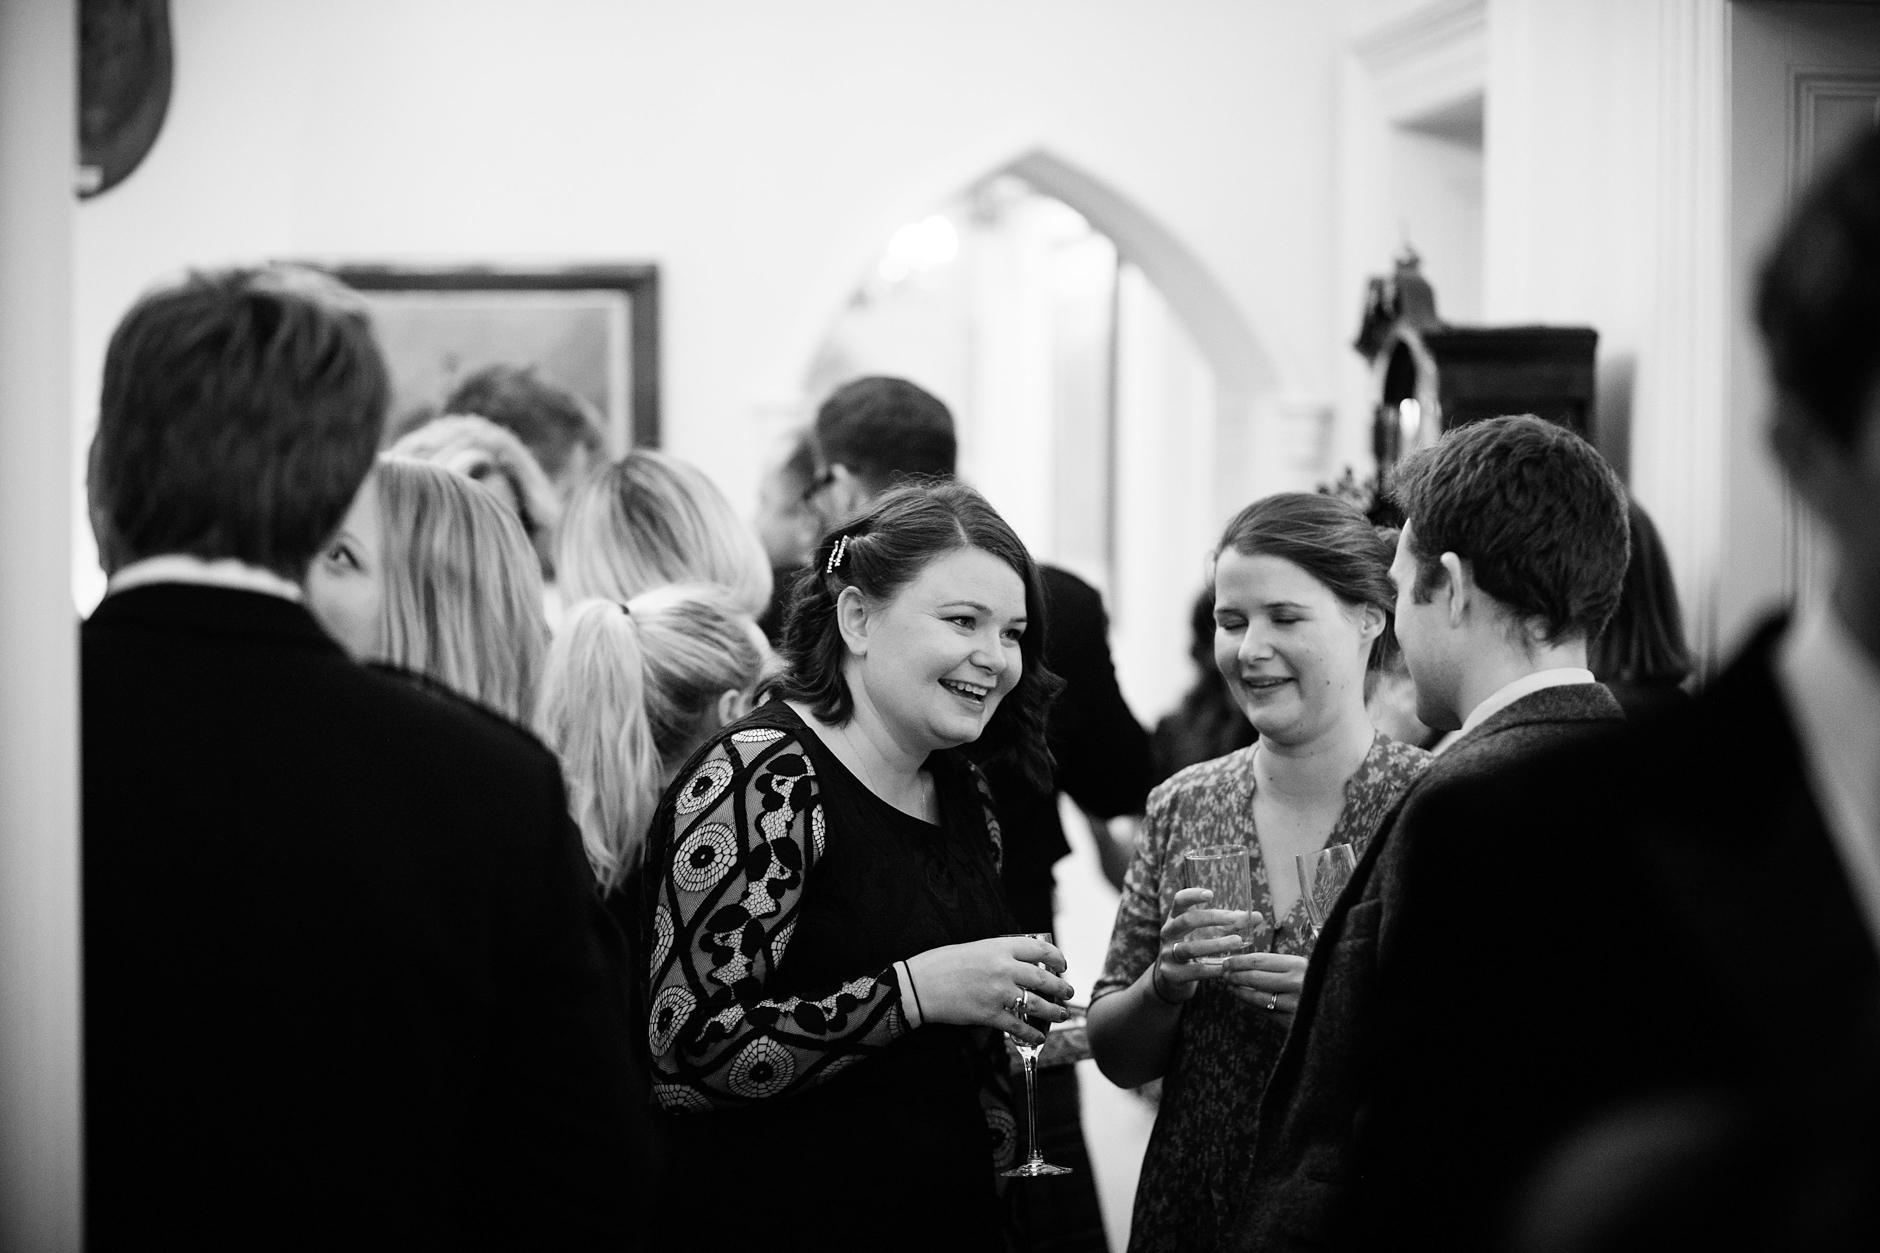 Glentruim-Wedding-Nikki-Leadbetter-Photography-240.jpg